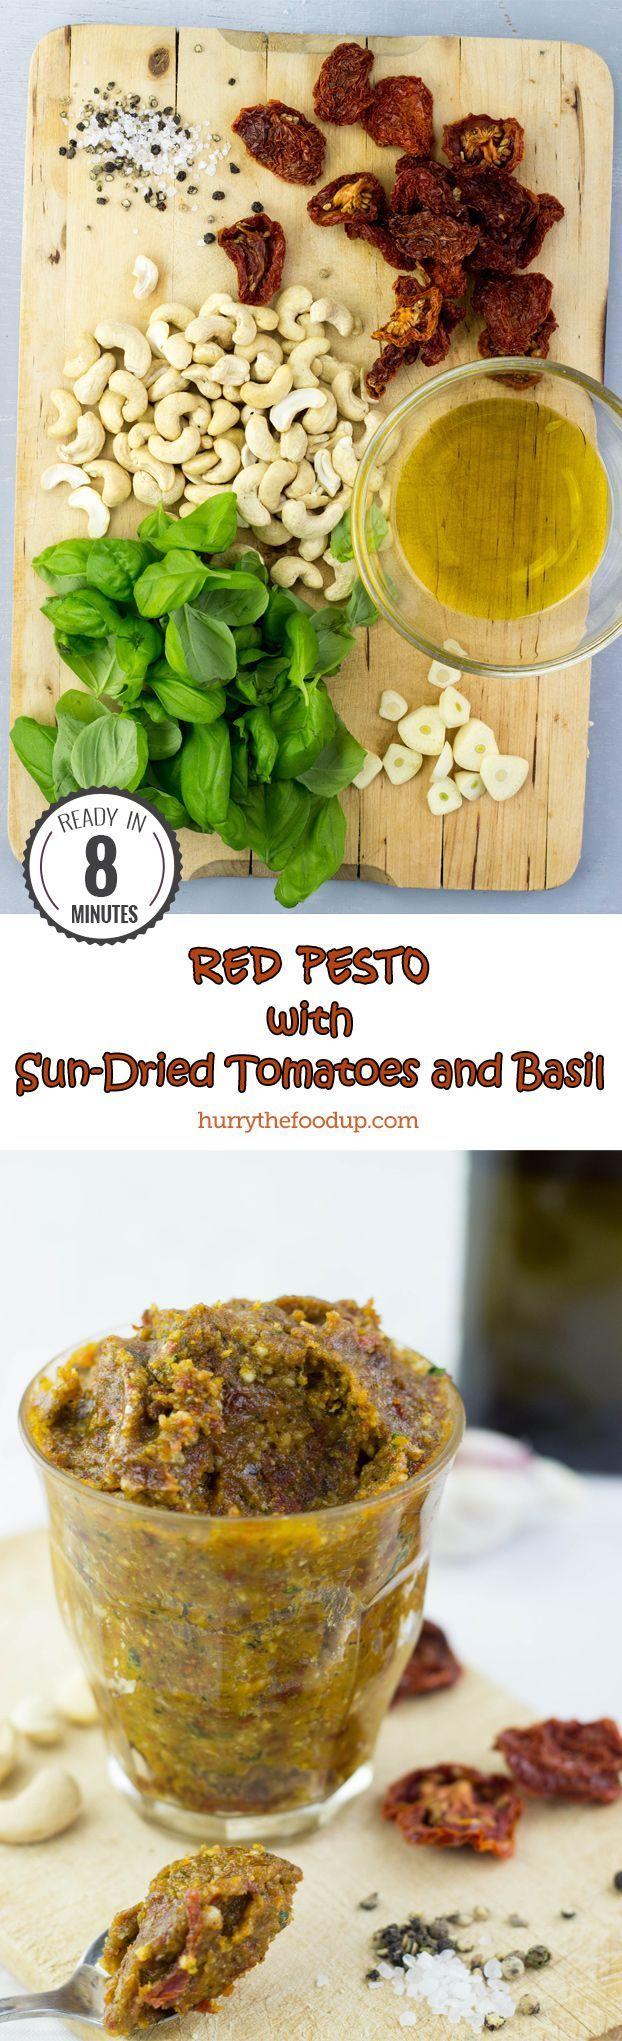 Red Pesto with Sun-Dried Tomatoes and Basil #vegan #pesto | http://hurrythefoodup.com